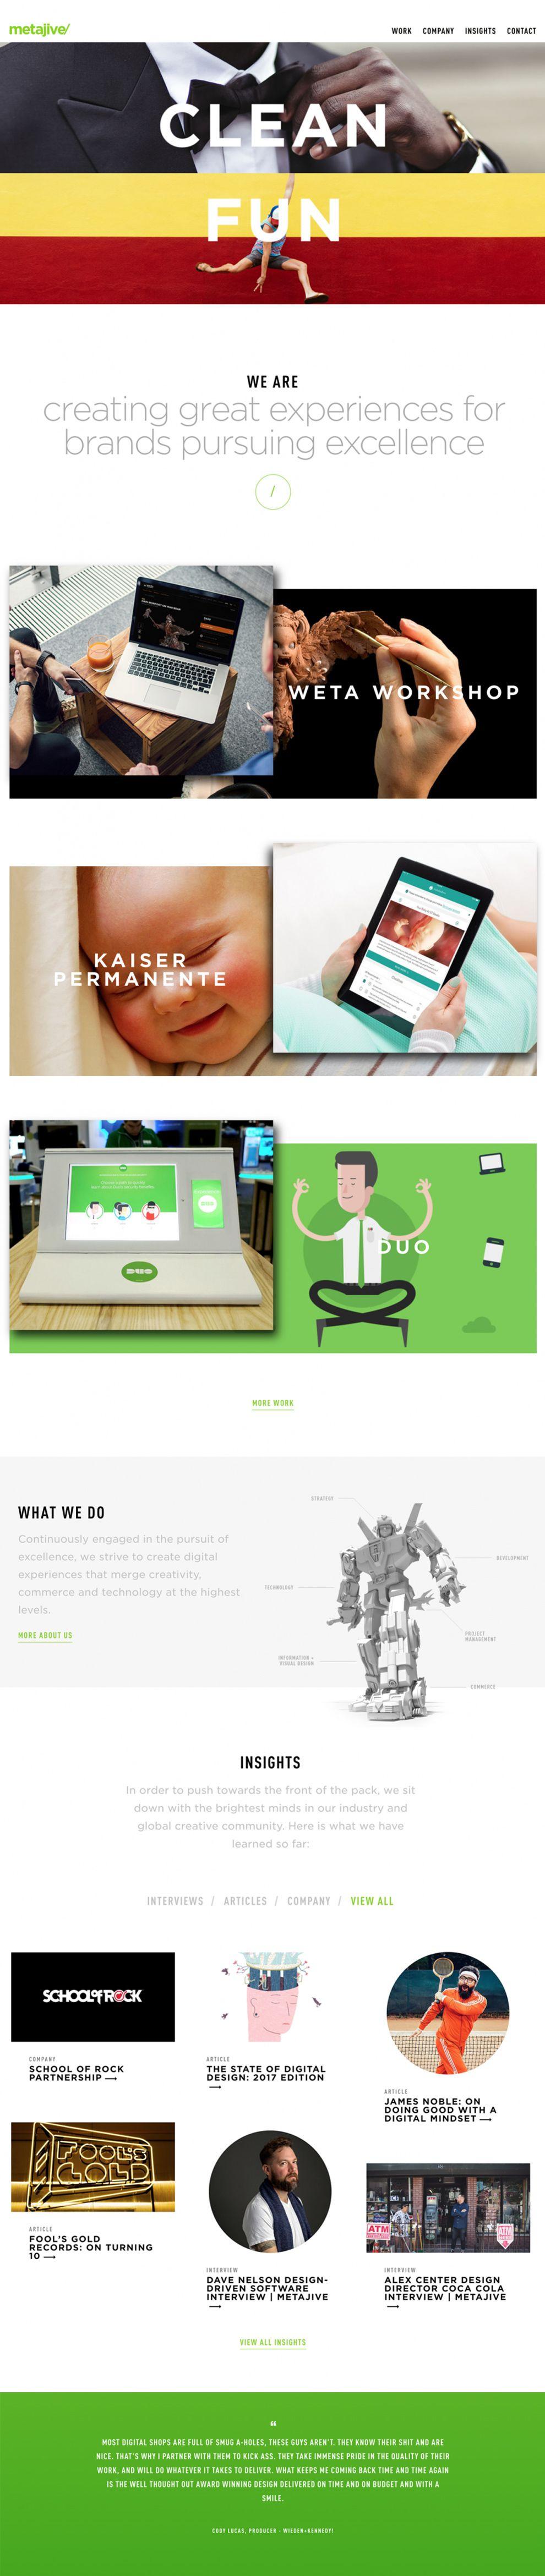 Metajive Clean Homepage